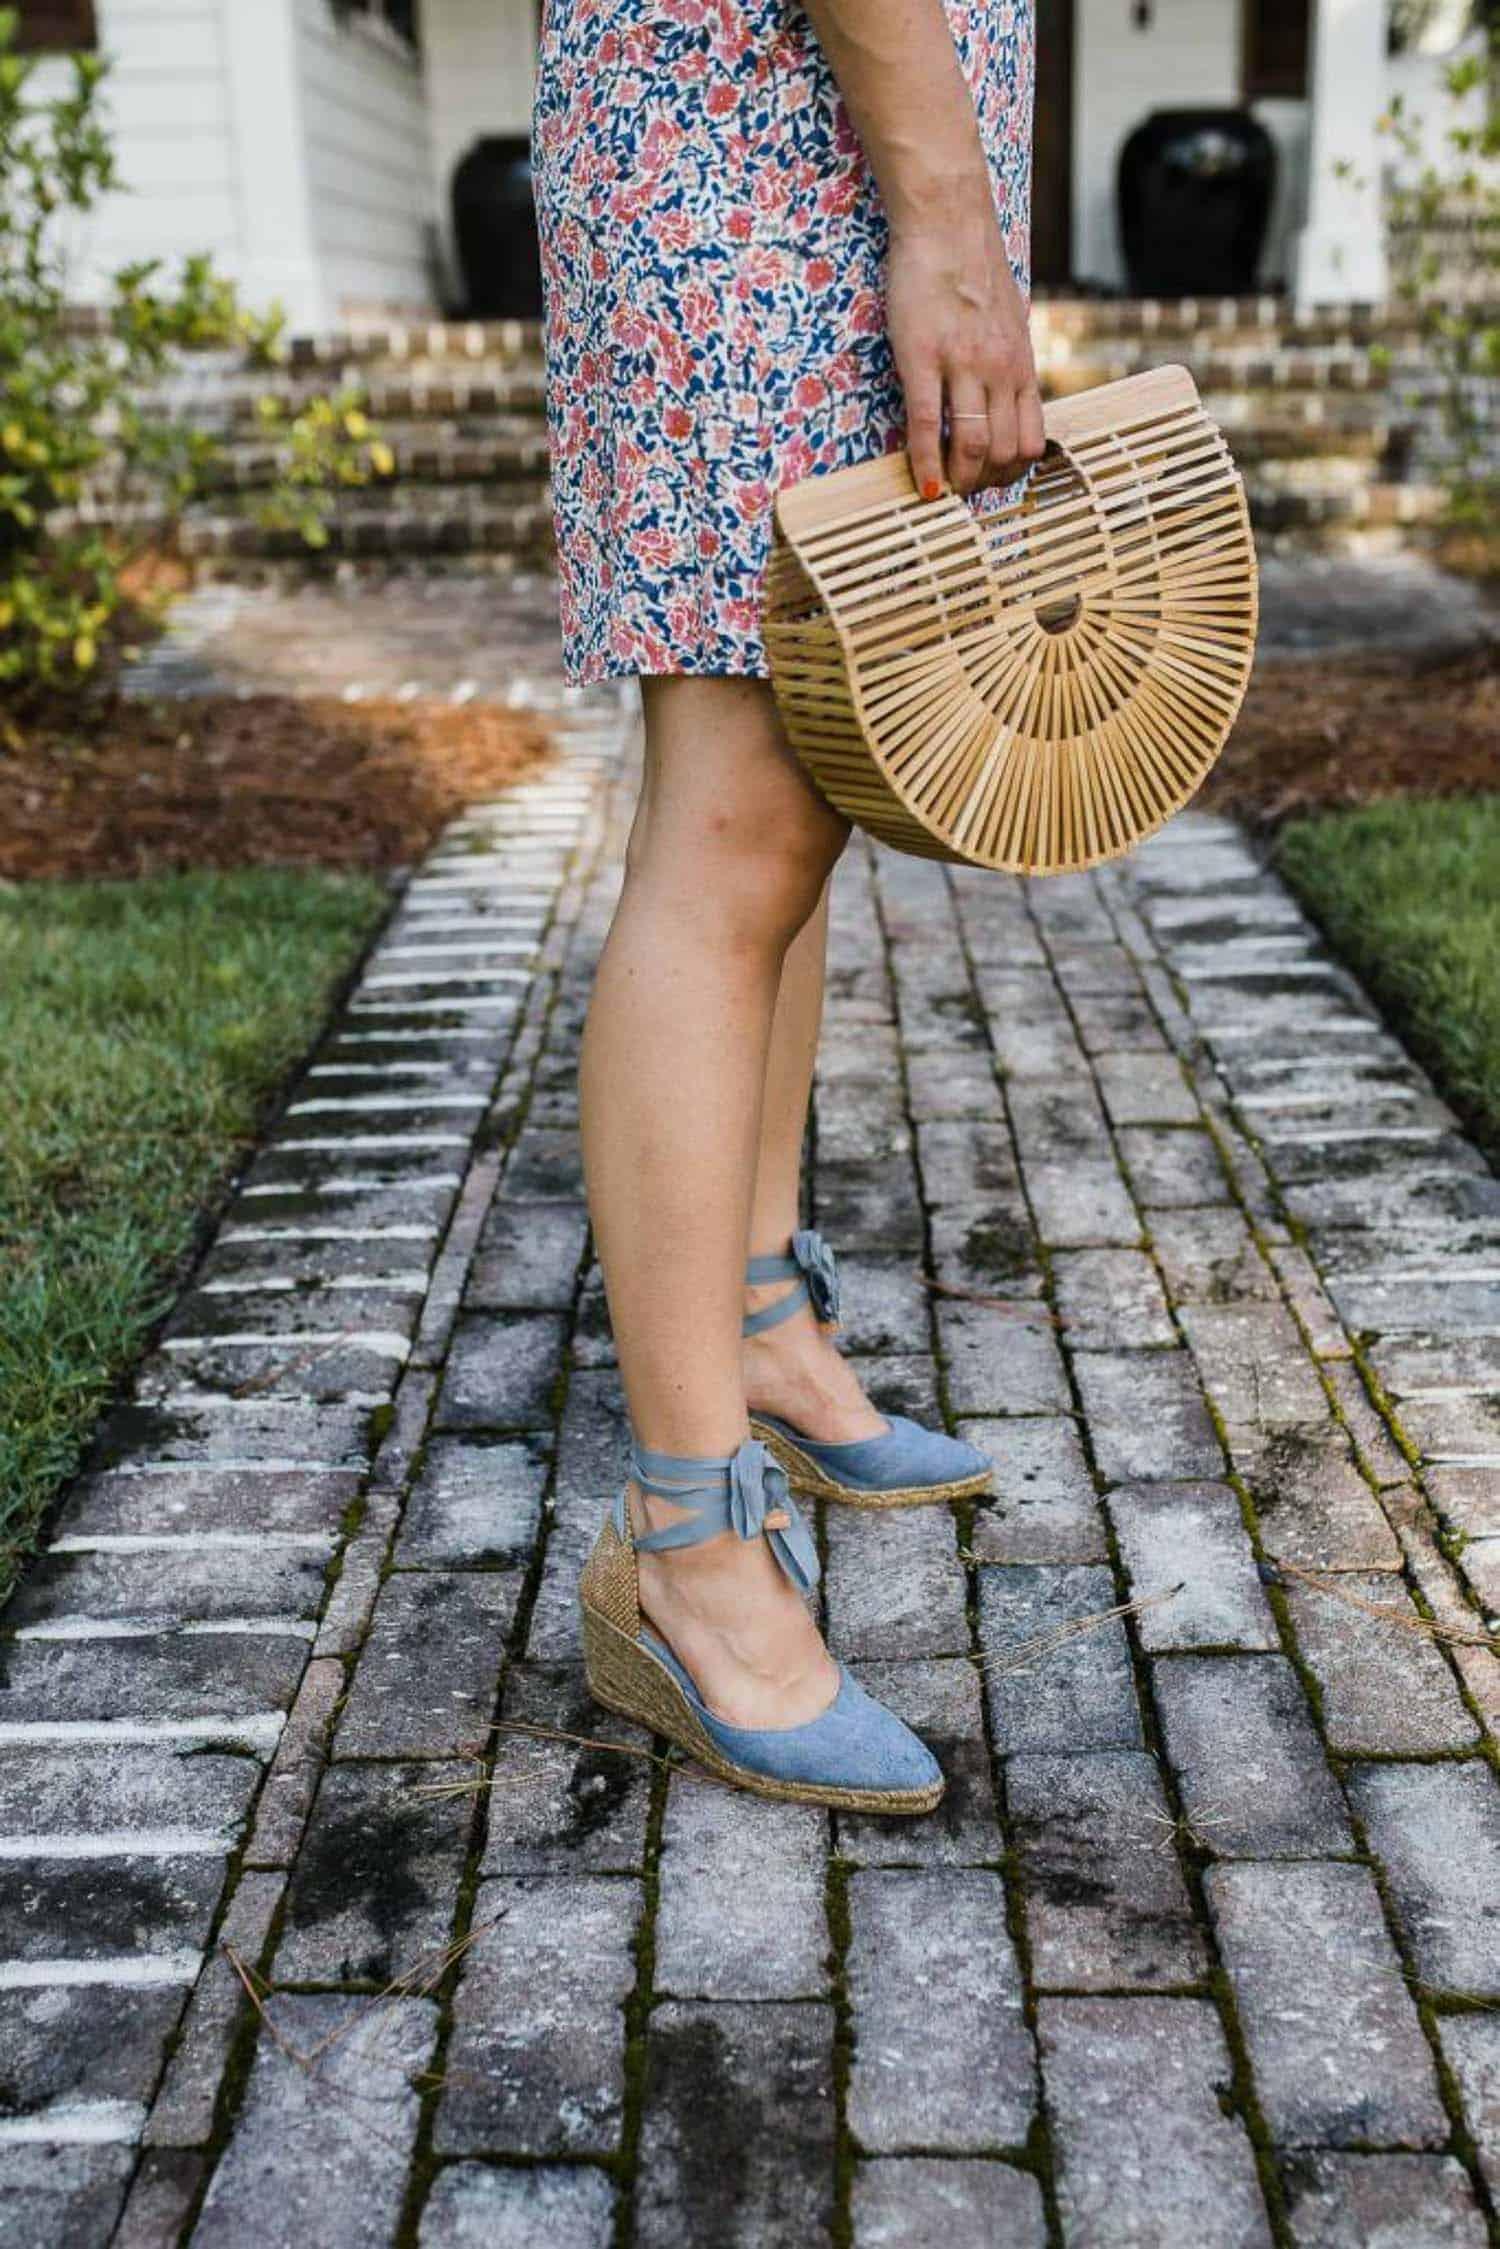 My Style Vita outfit details: 1 State Floral Mini Dress, Castaner Espadrilles, Cult Gaia Bag